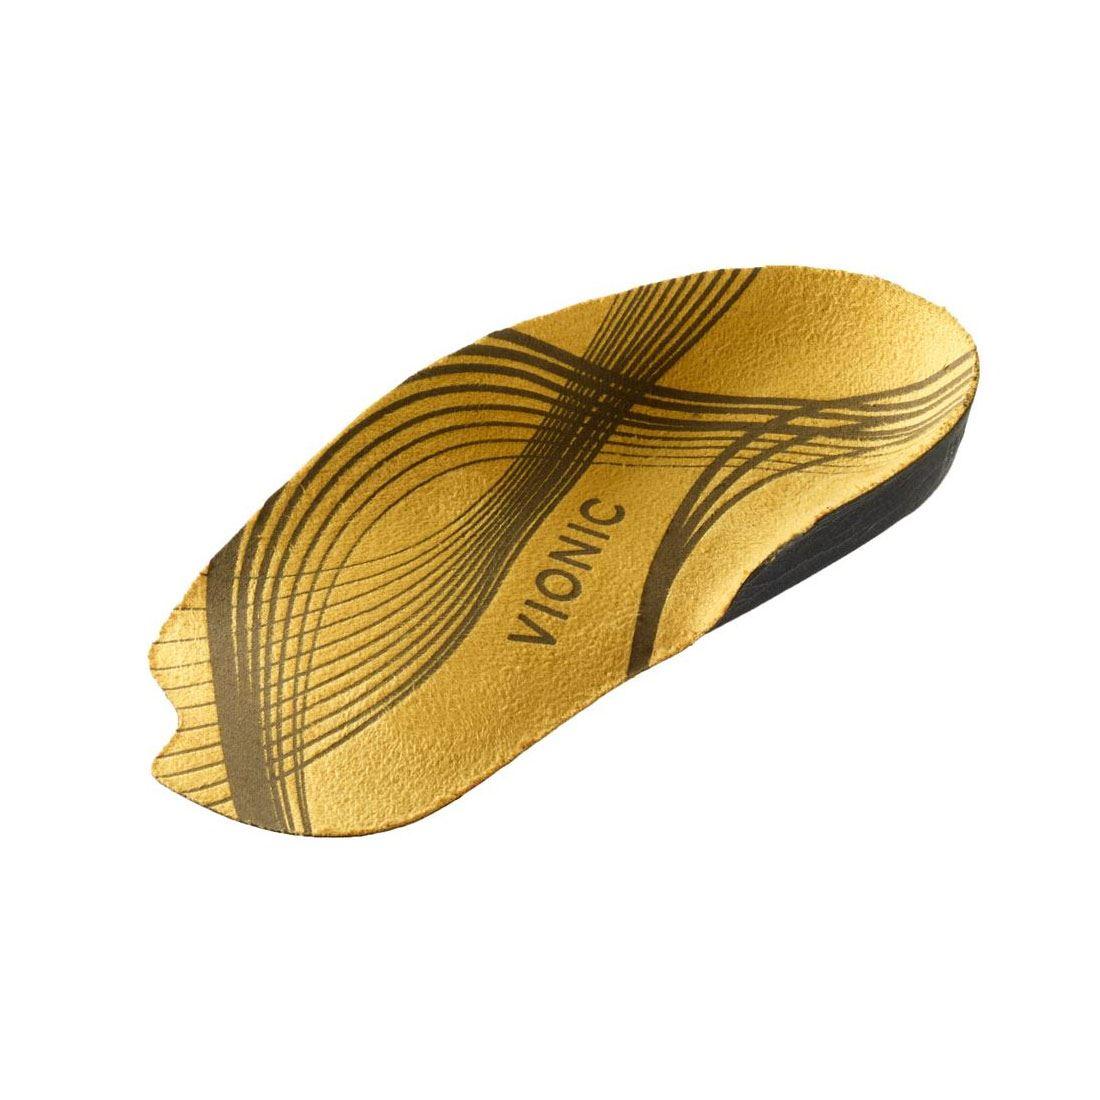 e66e5d6aa2 Vionic 3/4 Length Orthotics   4 Degree Rear Foot Correction